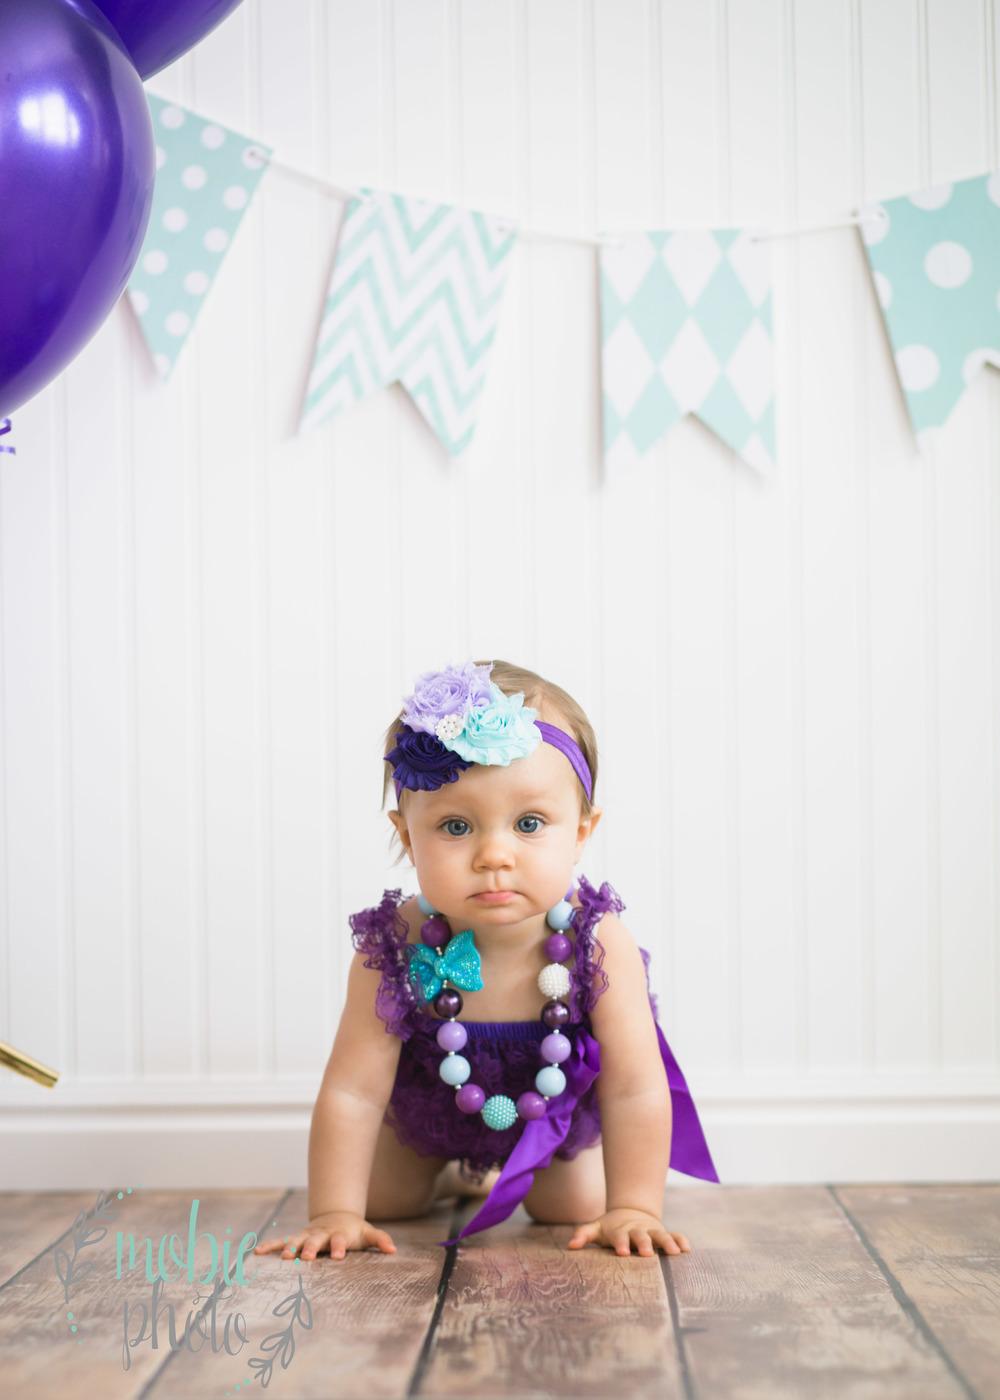 Mobie Photo - First Birthday Pictures - Lehi, Utah